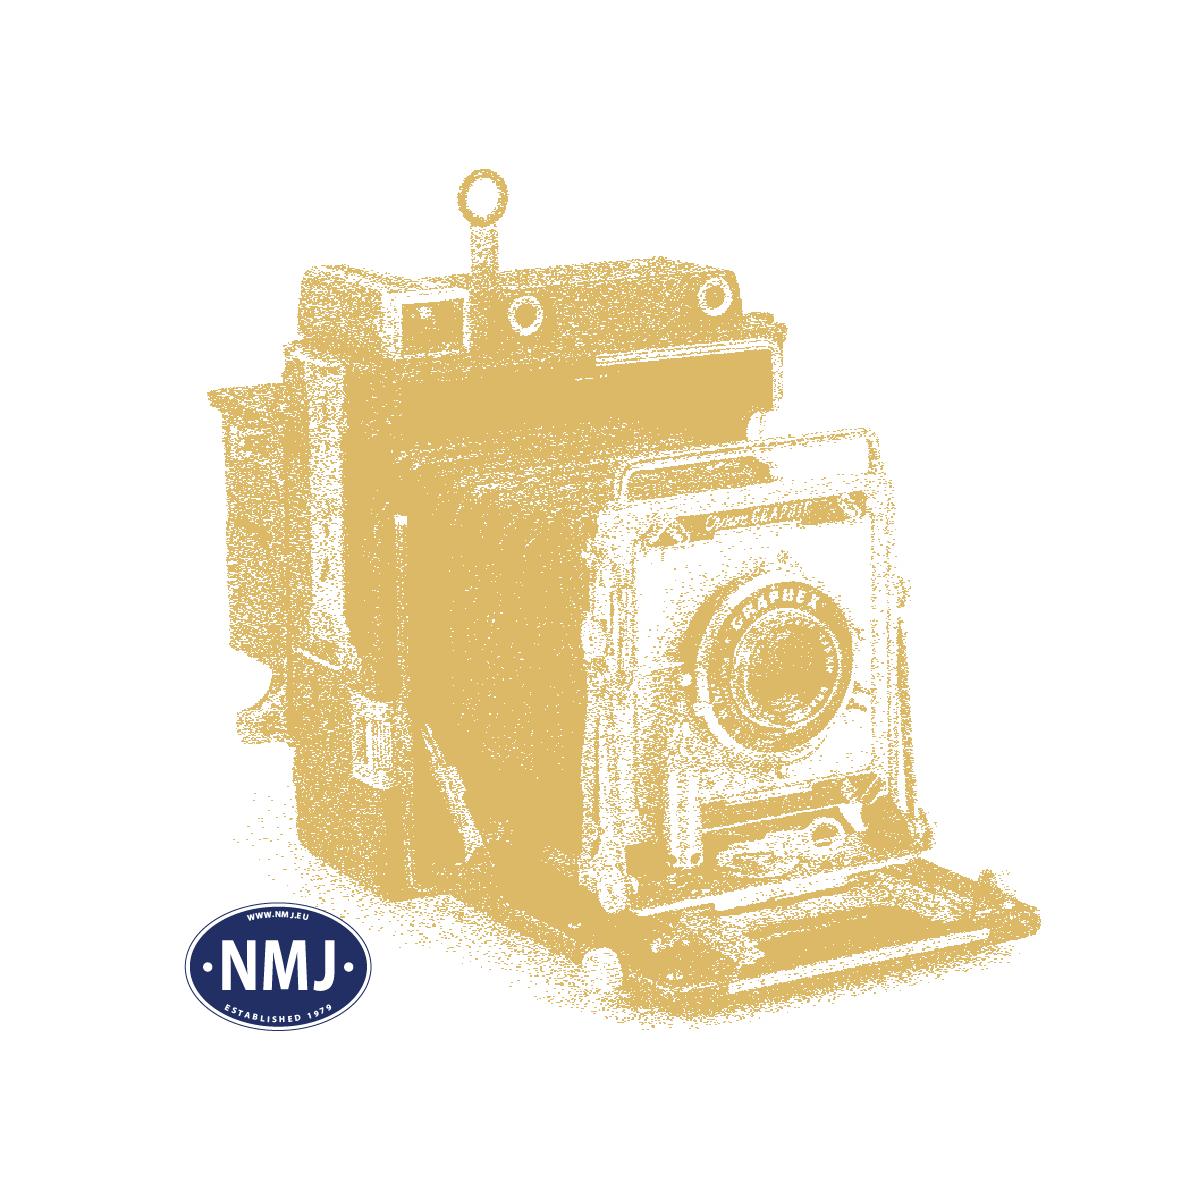 NMJT90302 - NMJ Topline CFL 1603 (1956-1971), DCC m/ Lyd